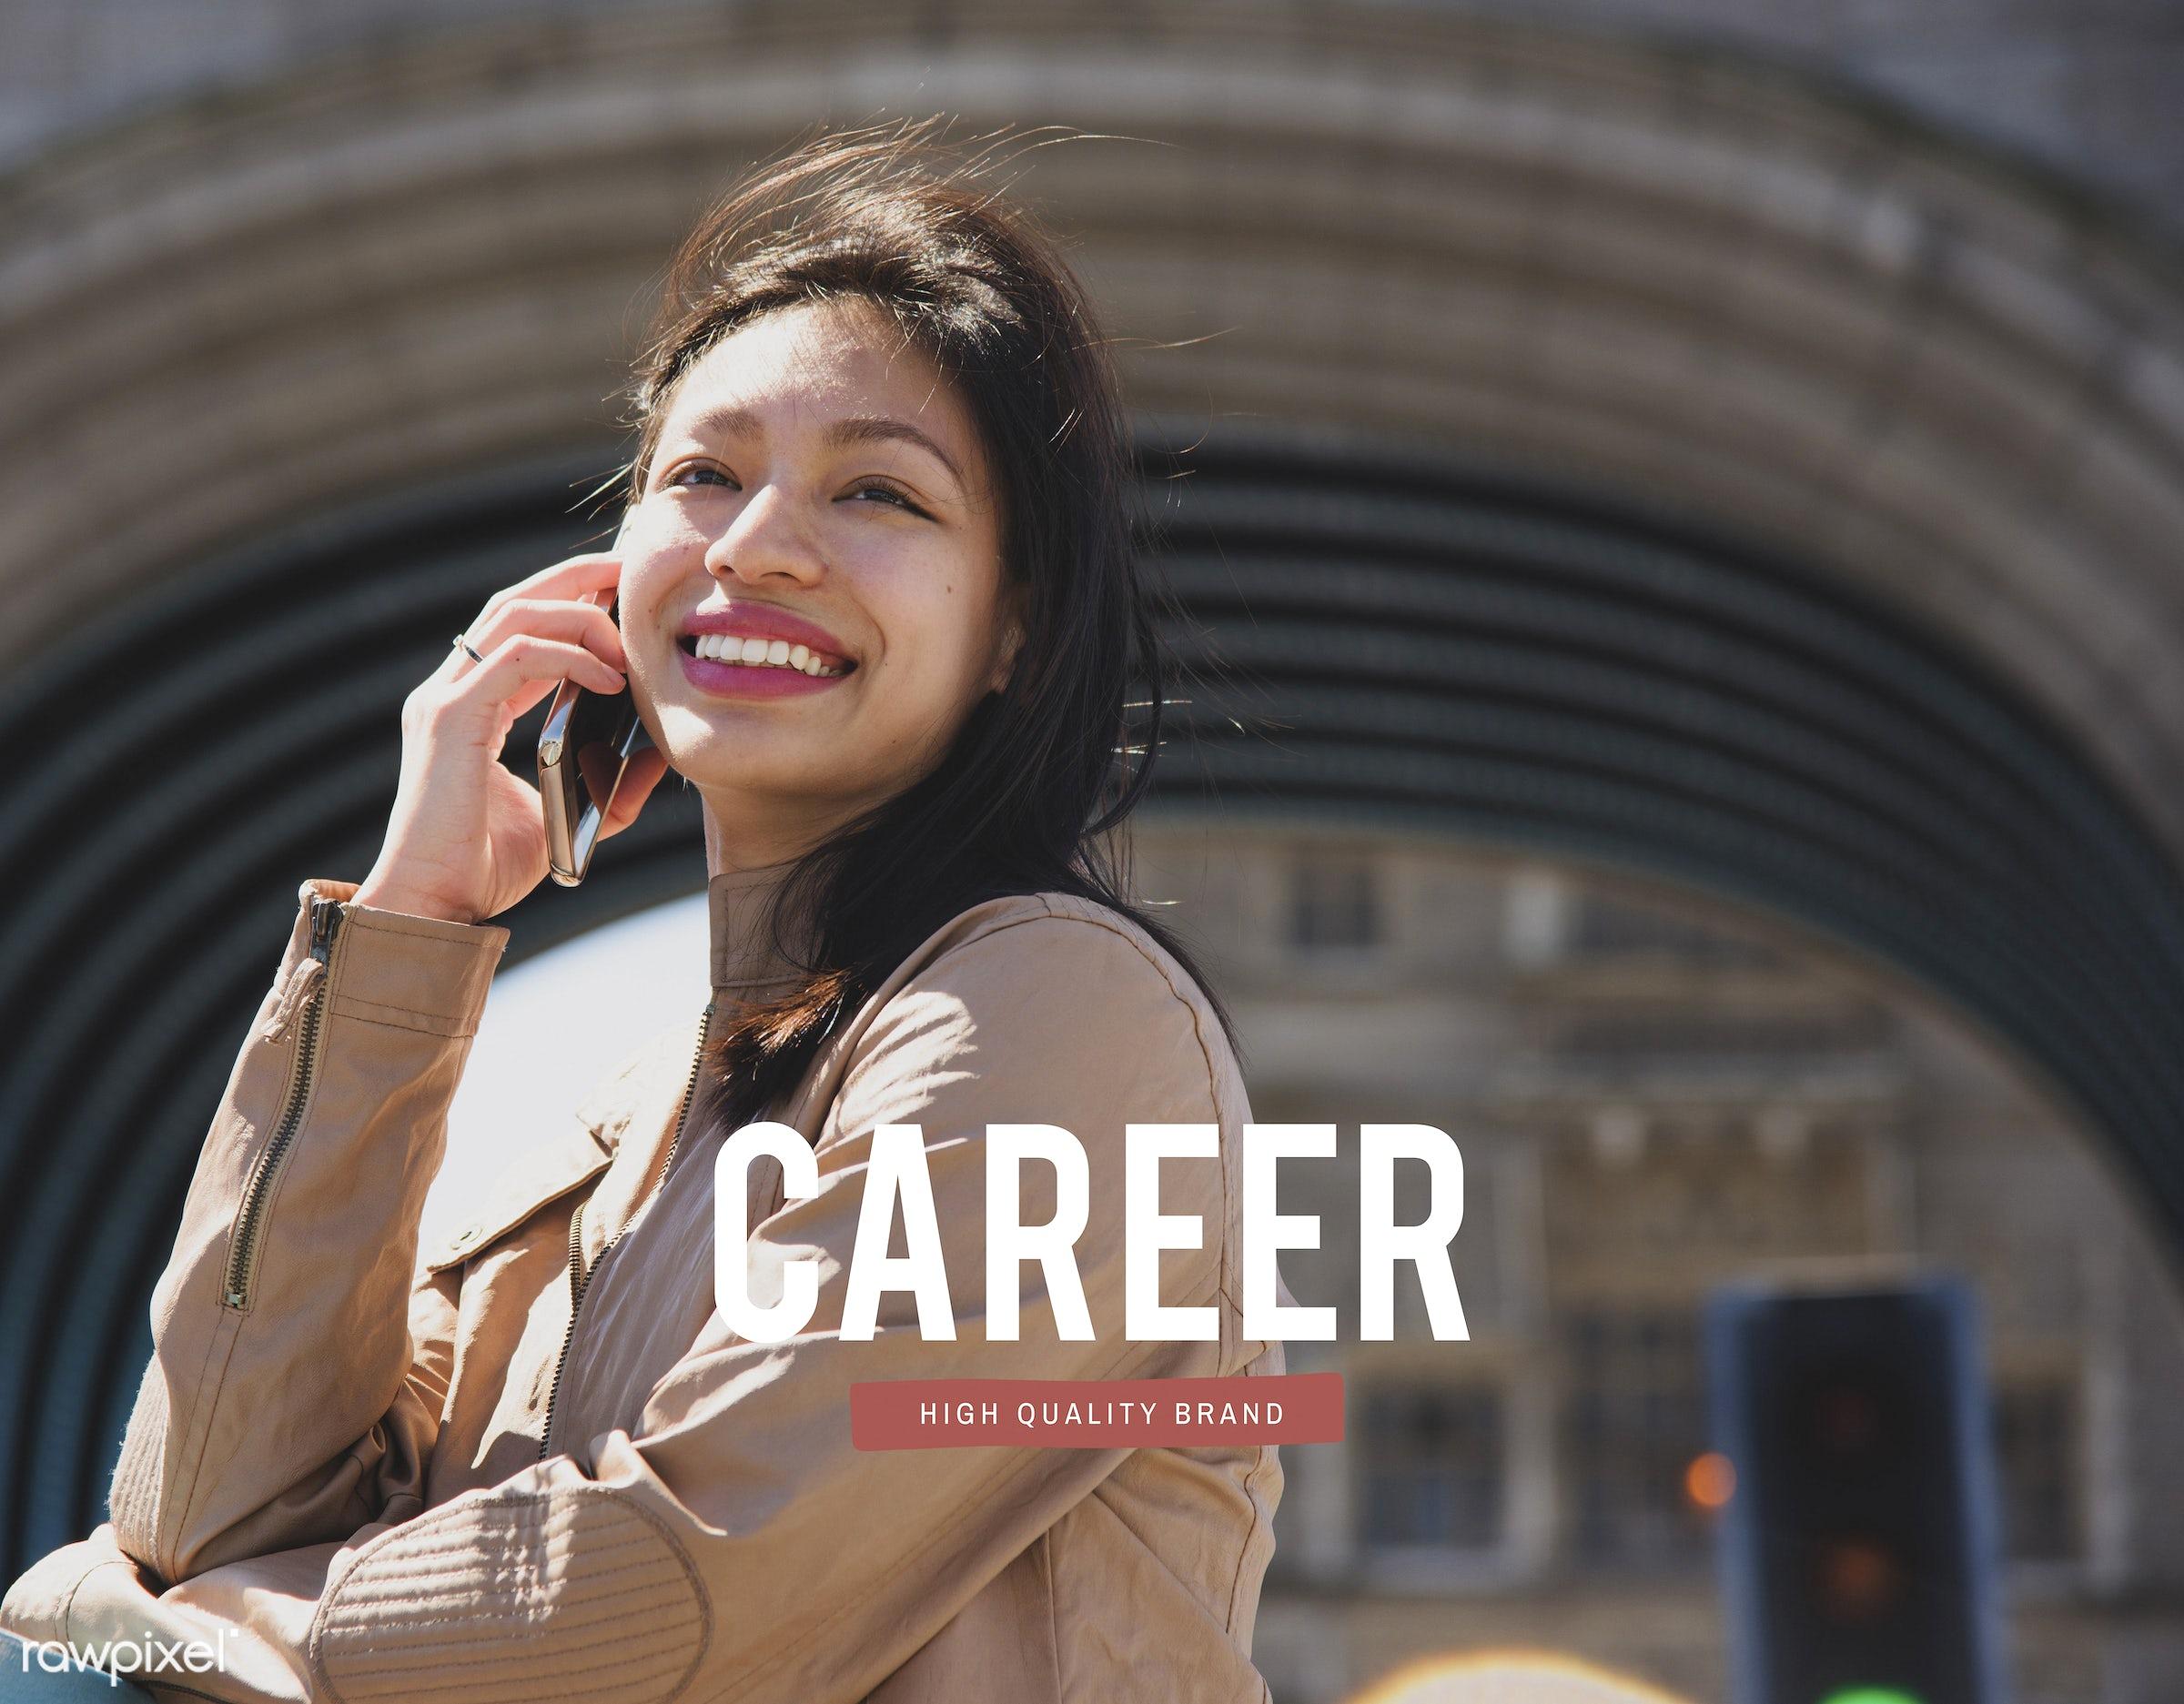 asian, bridge, britian, call, calling, captionadded, career, career tools, careers, cellphone, communication, downtown,...